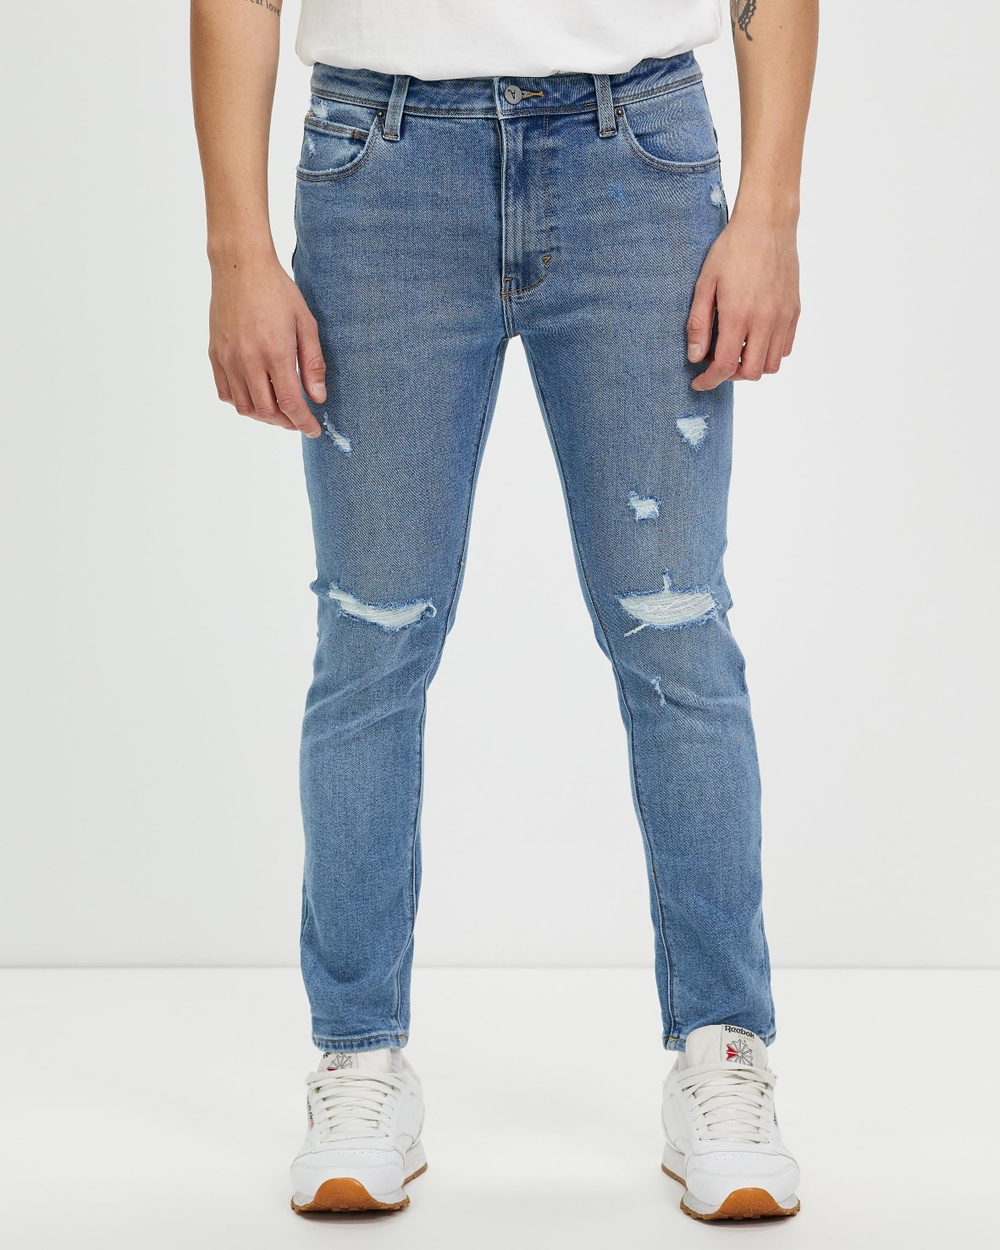 Abrand A Dropped Skinny Jeans Cam Cam Shred